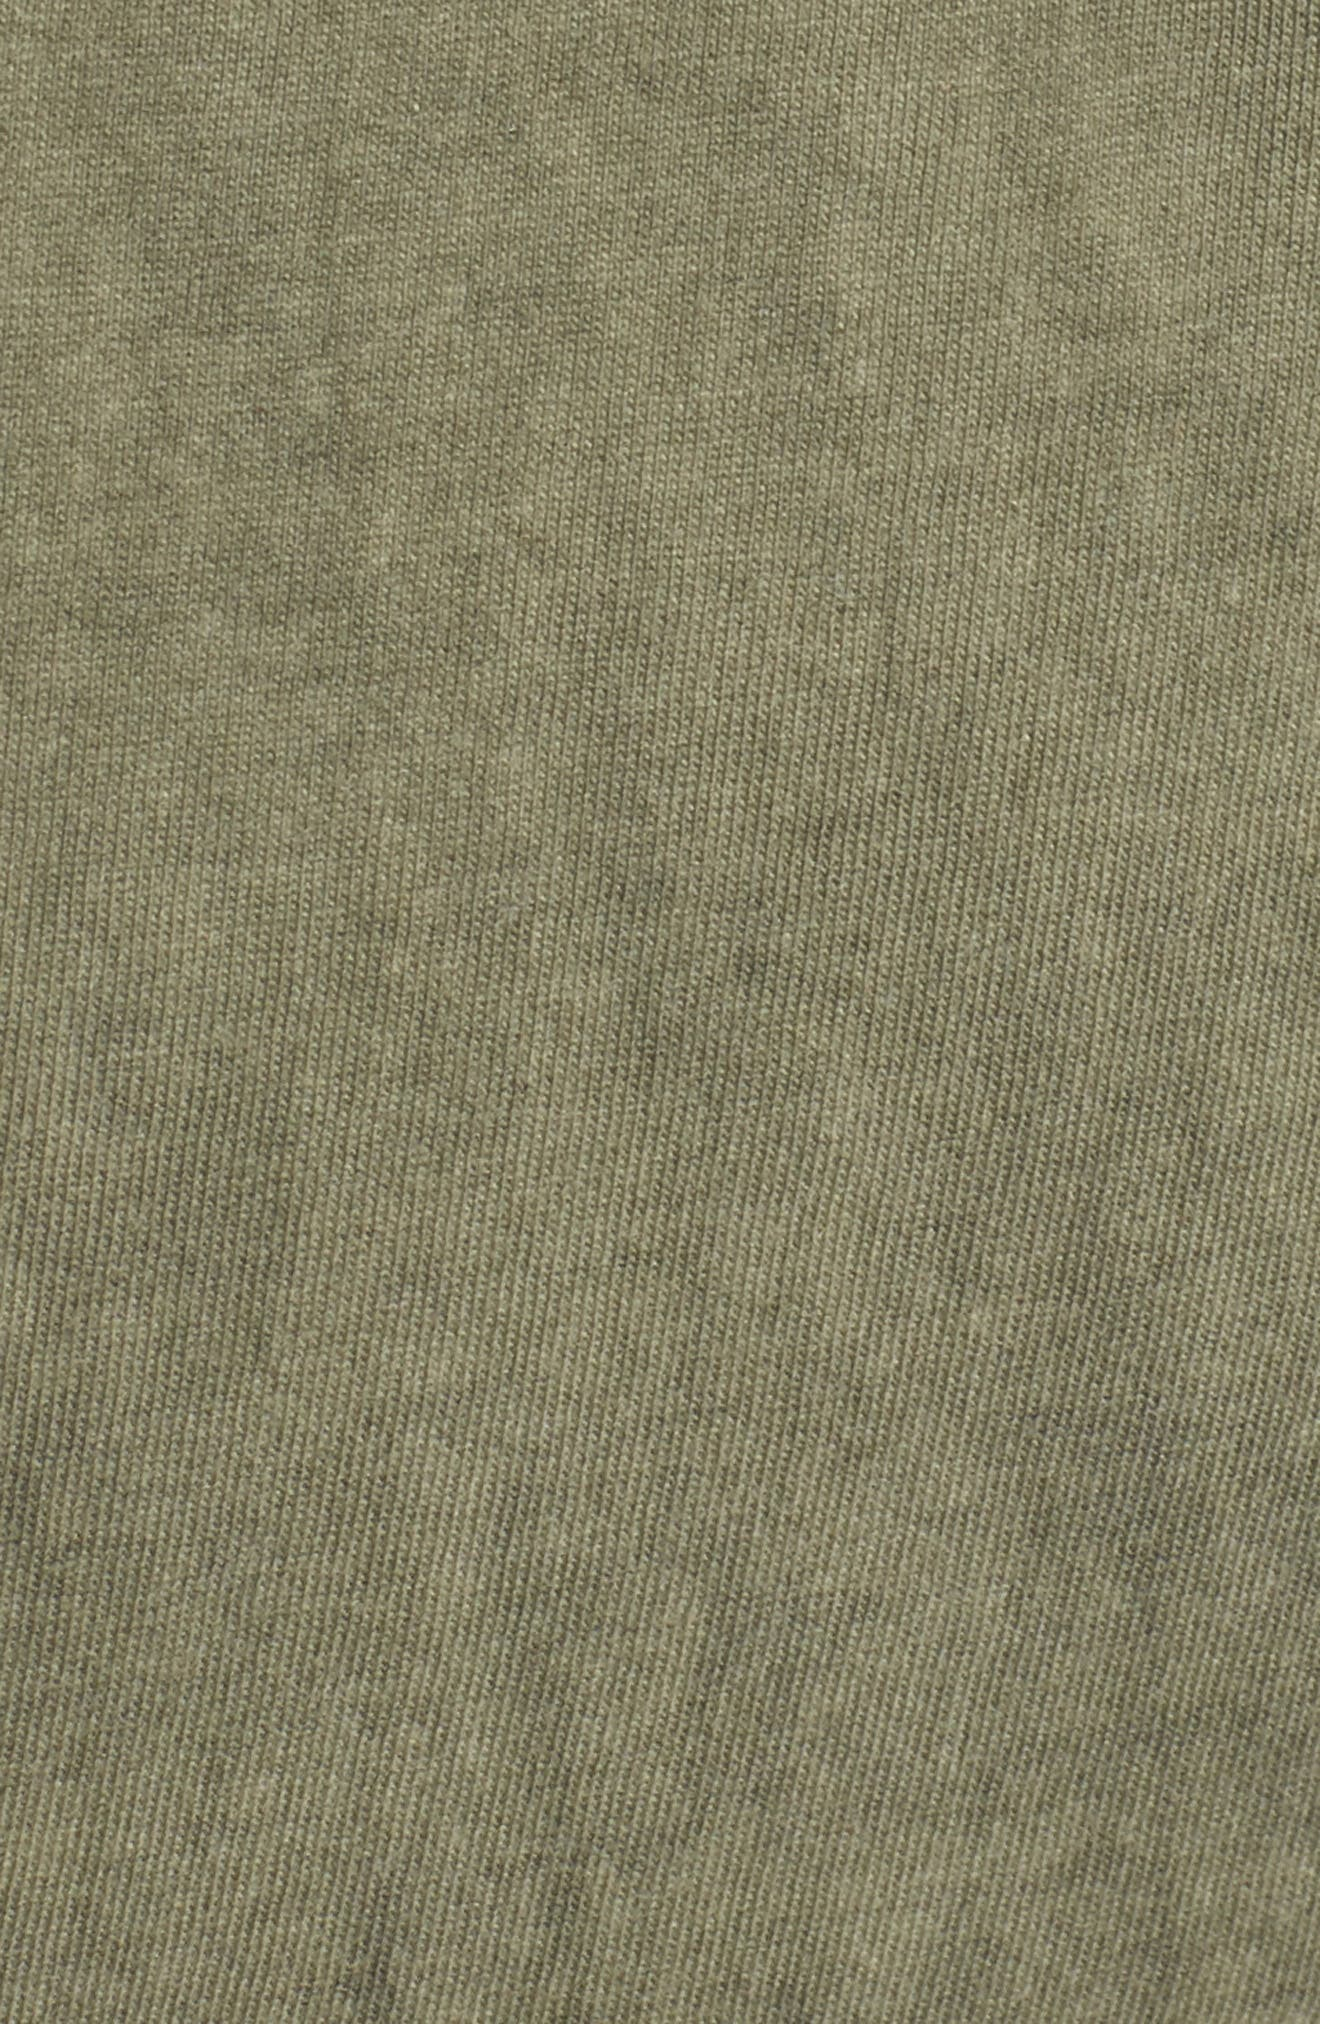 Scoop Neck Body-Con Dress,                             Alternate thumbnail 5, color,                             Olive Smoke